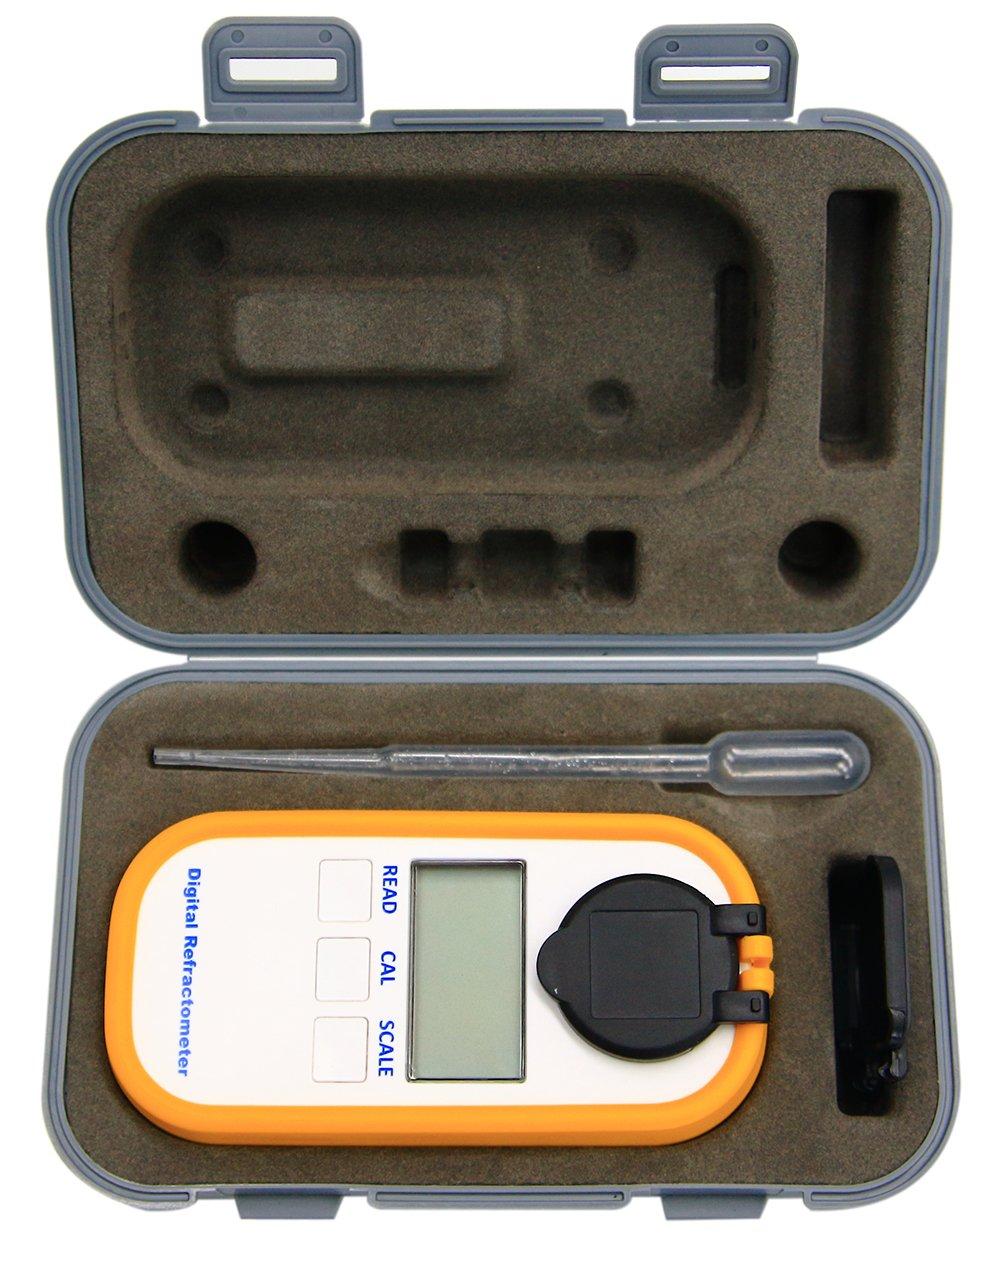 Digital Coffee Densitometer, Coffee Concentration Refractometer, Sugar Drinks Density Meter, Portable Coffee Brix TDS Meter by AMTAST (Image #5)